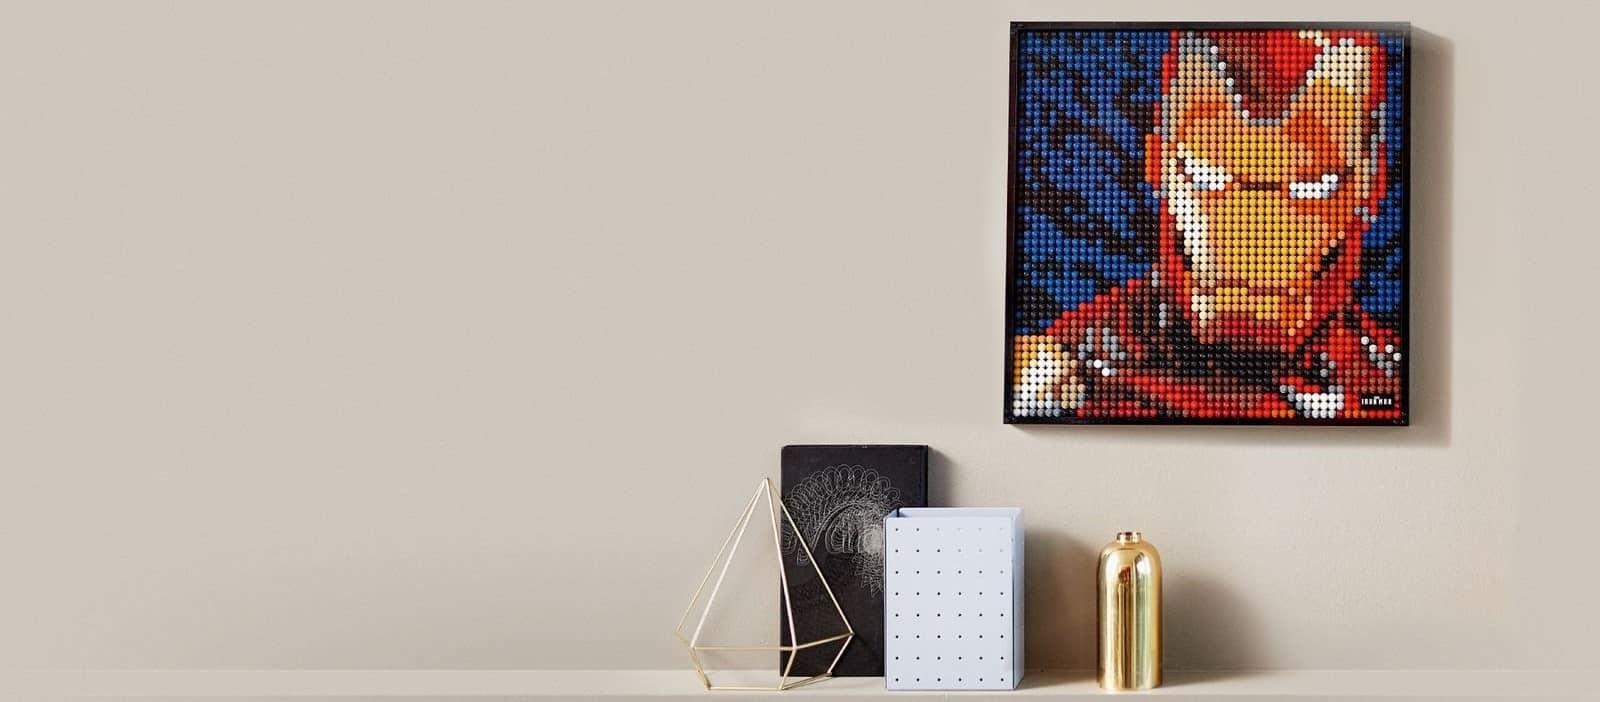 Lego art: arredare le pareti divertendosi